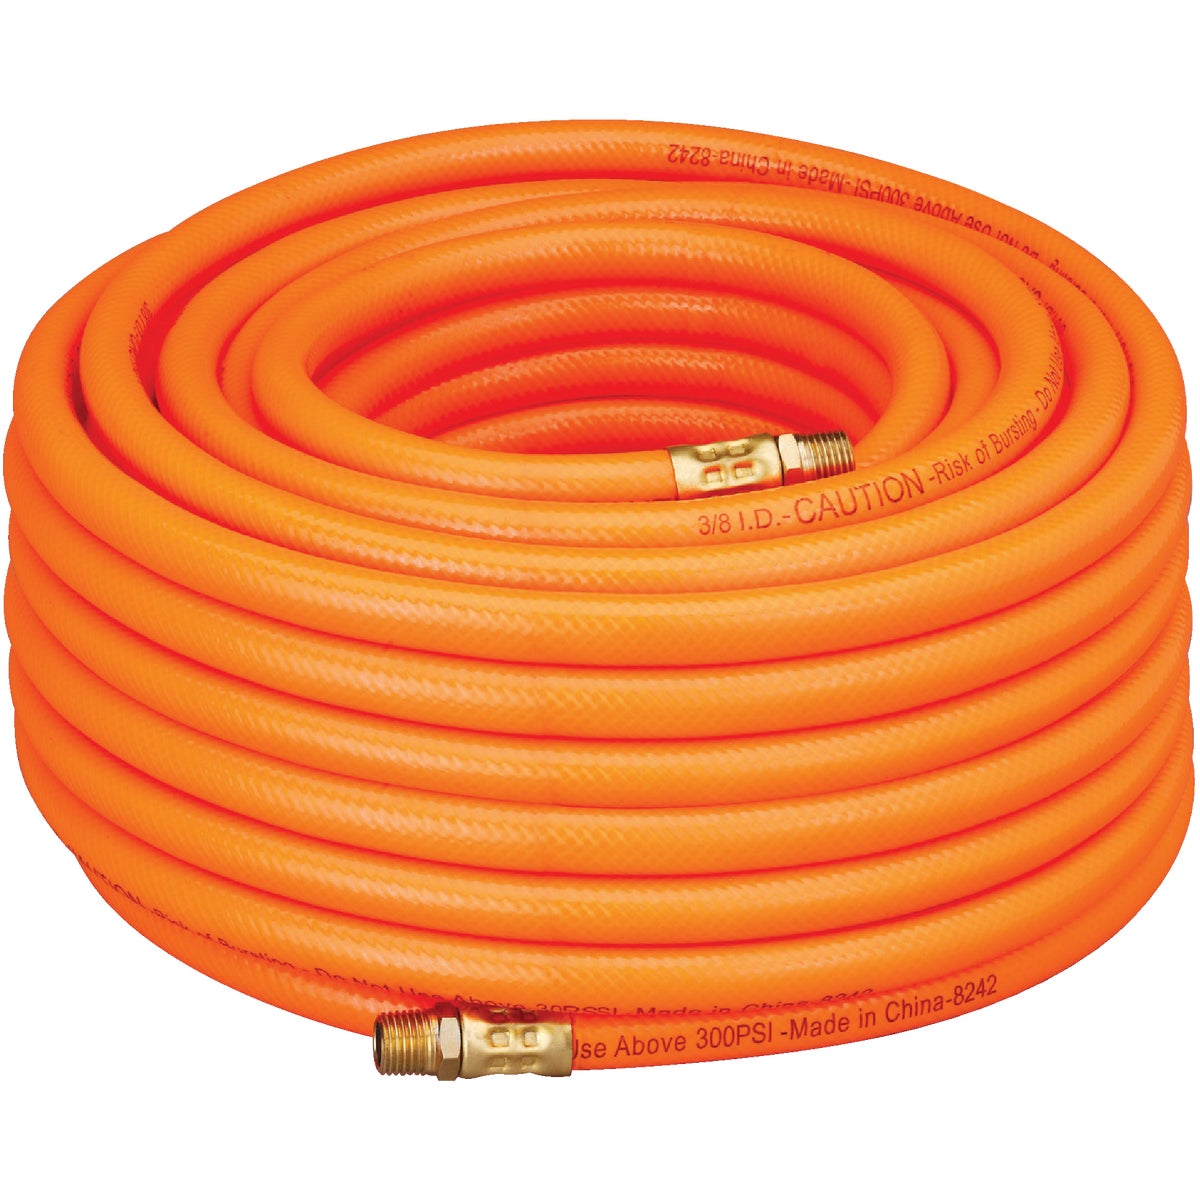 "3/8""X100' PVC AIR HOSE - 576-100A by Plews  Lubrimatic"